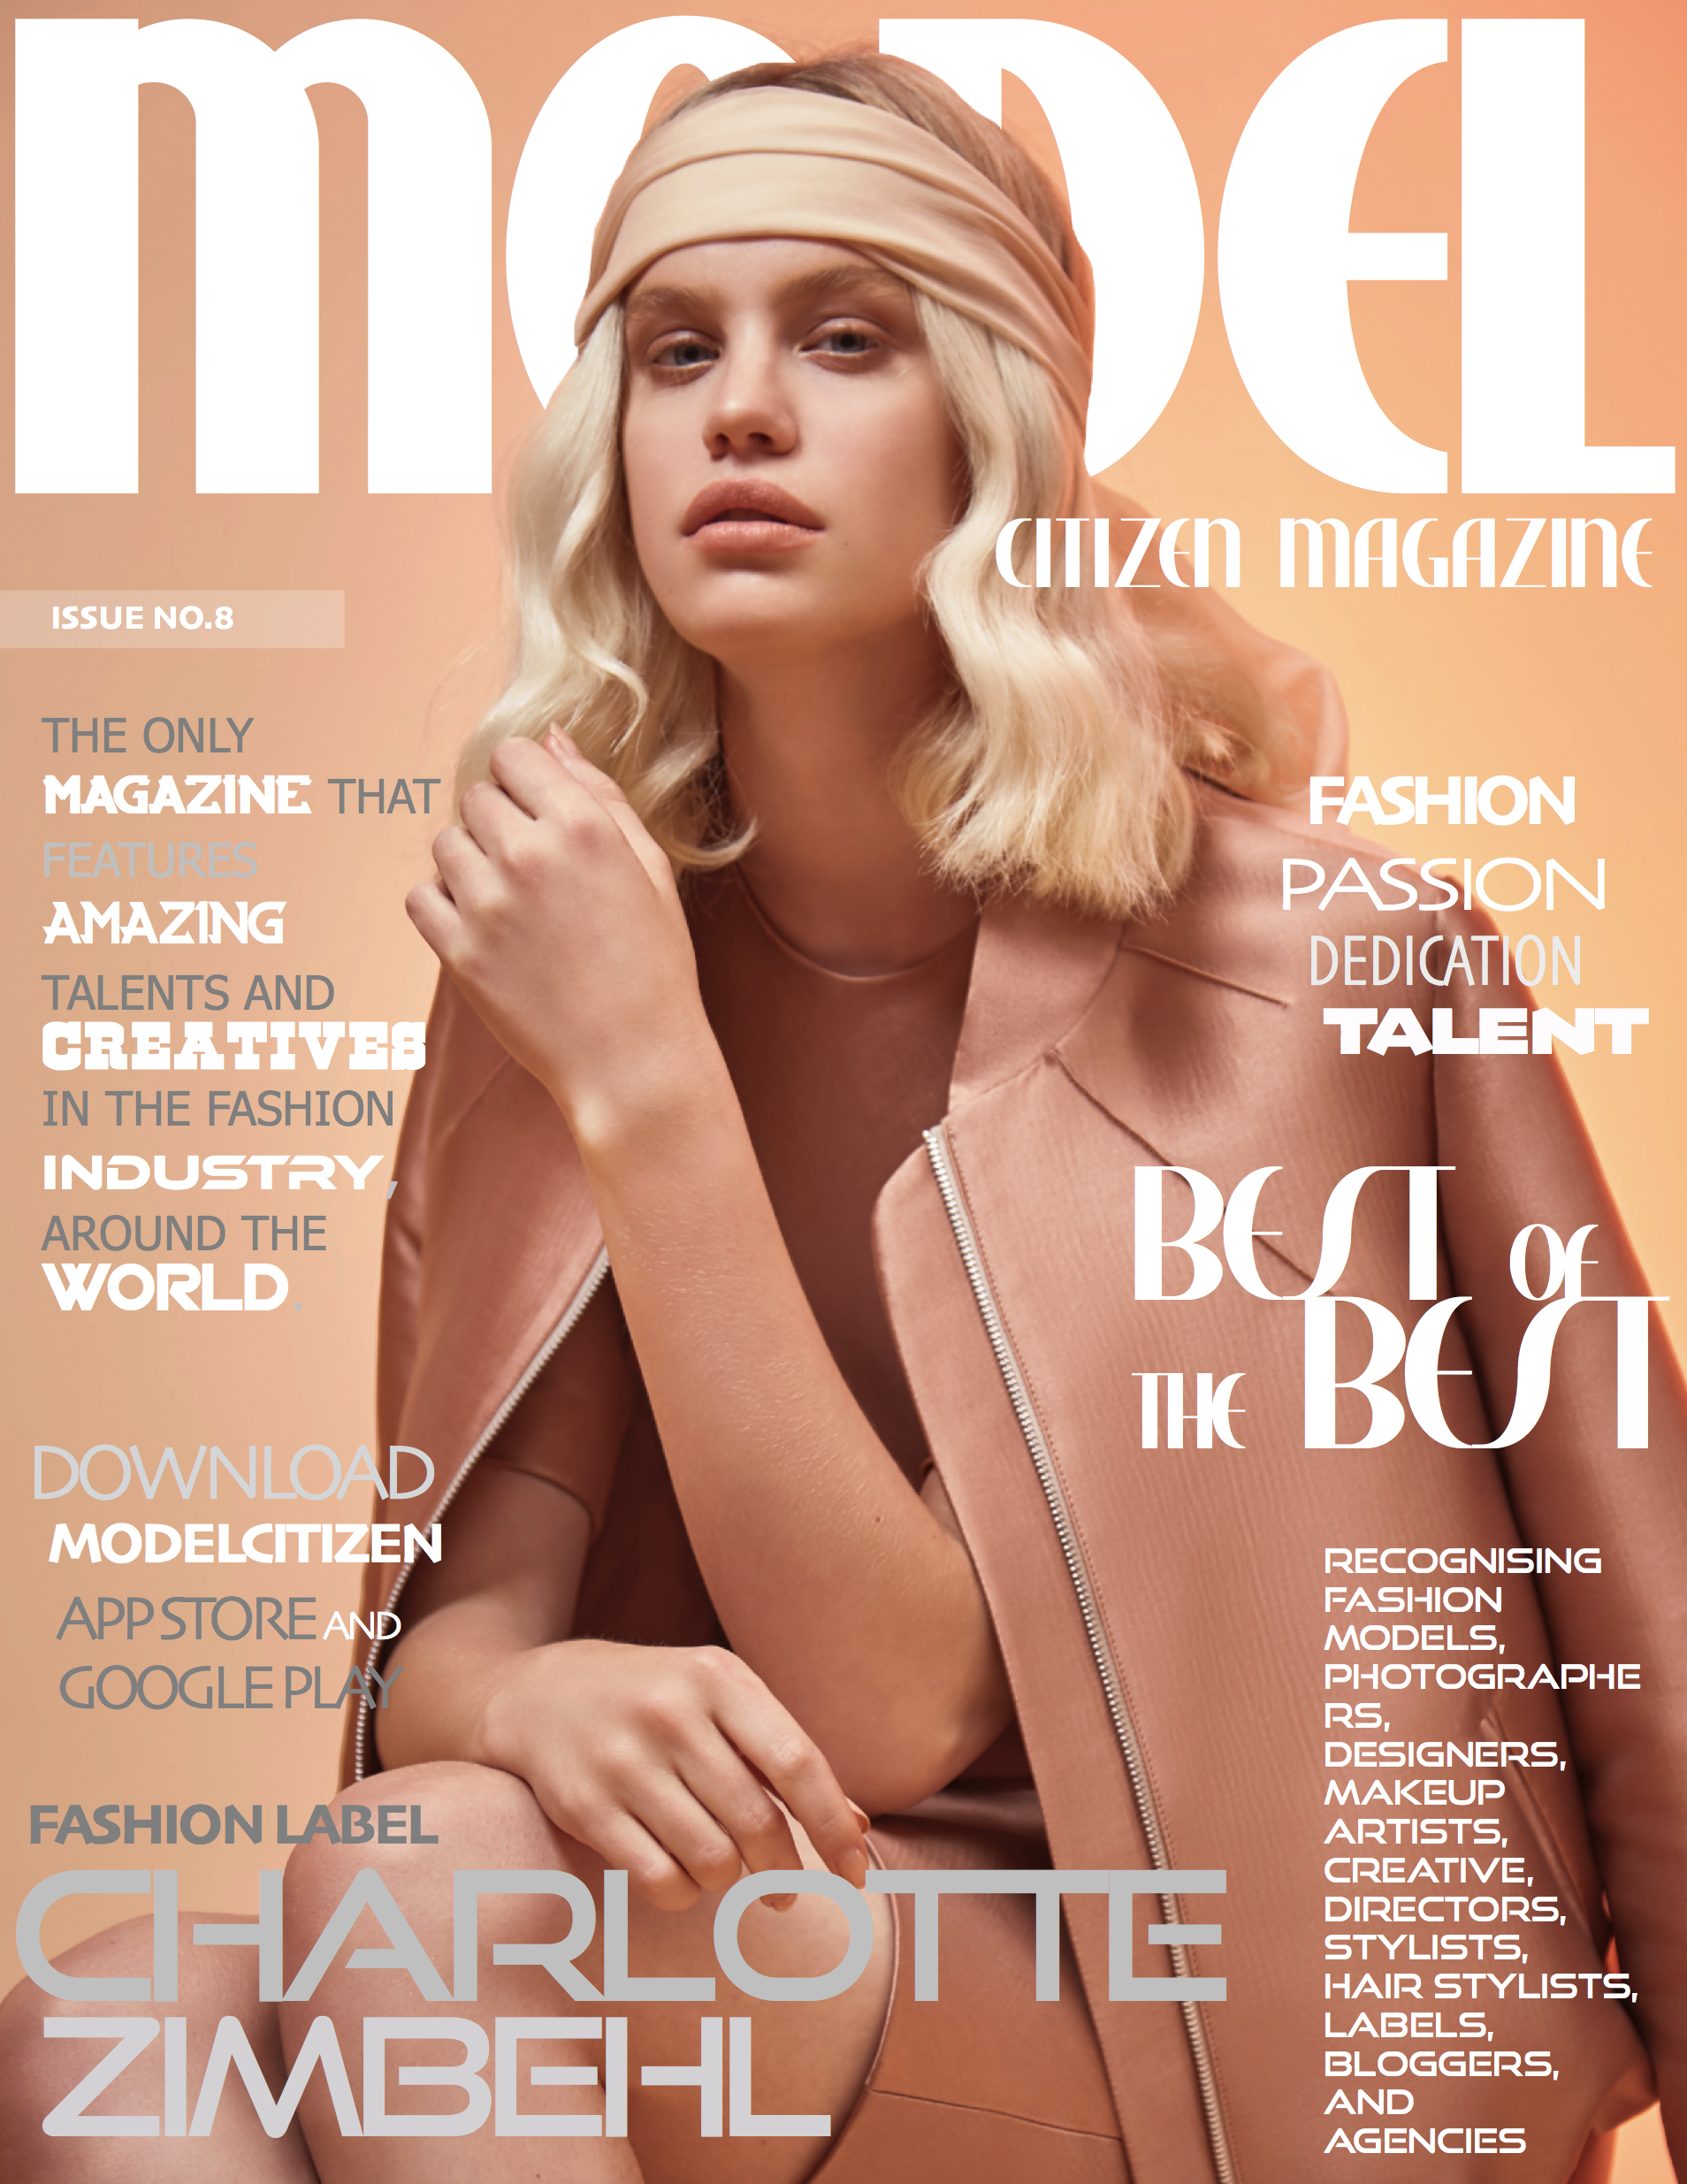 Charlotte Zimbehl, Model Citizen Magazine